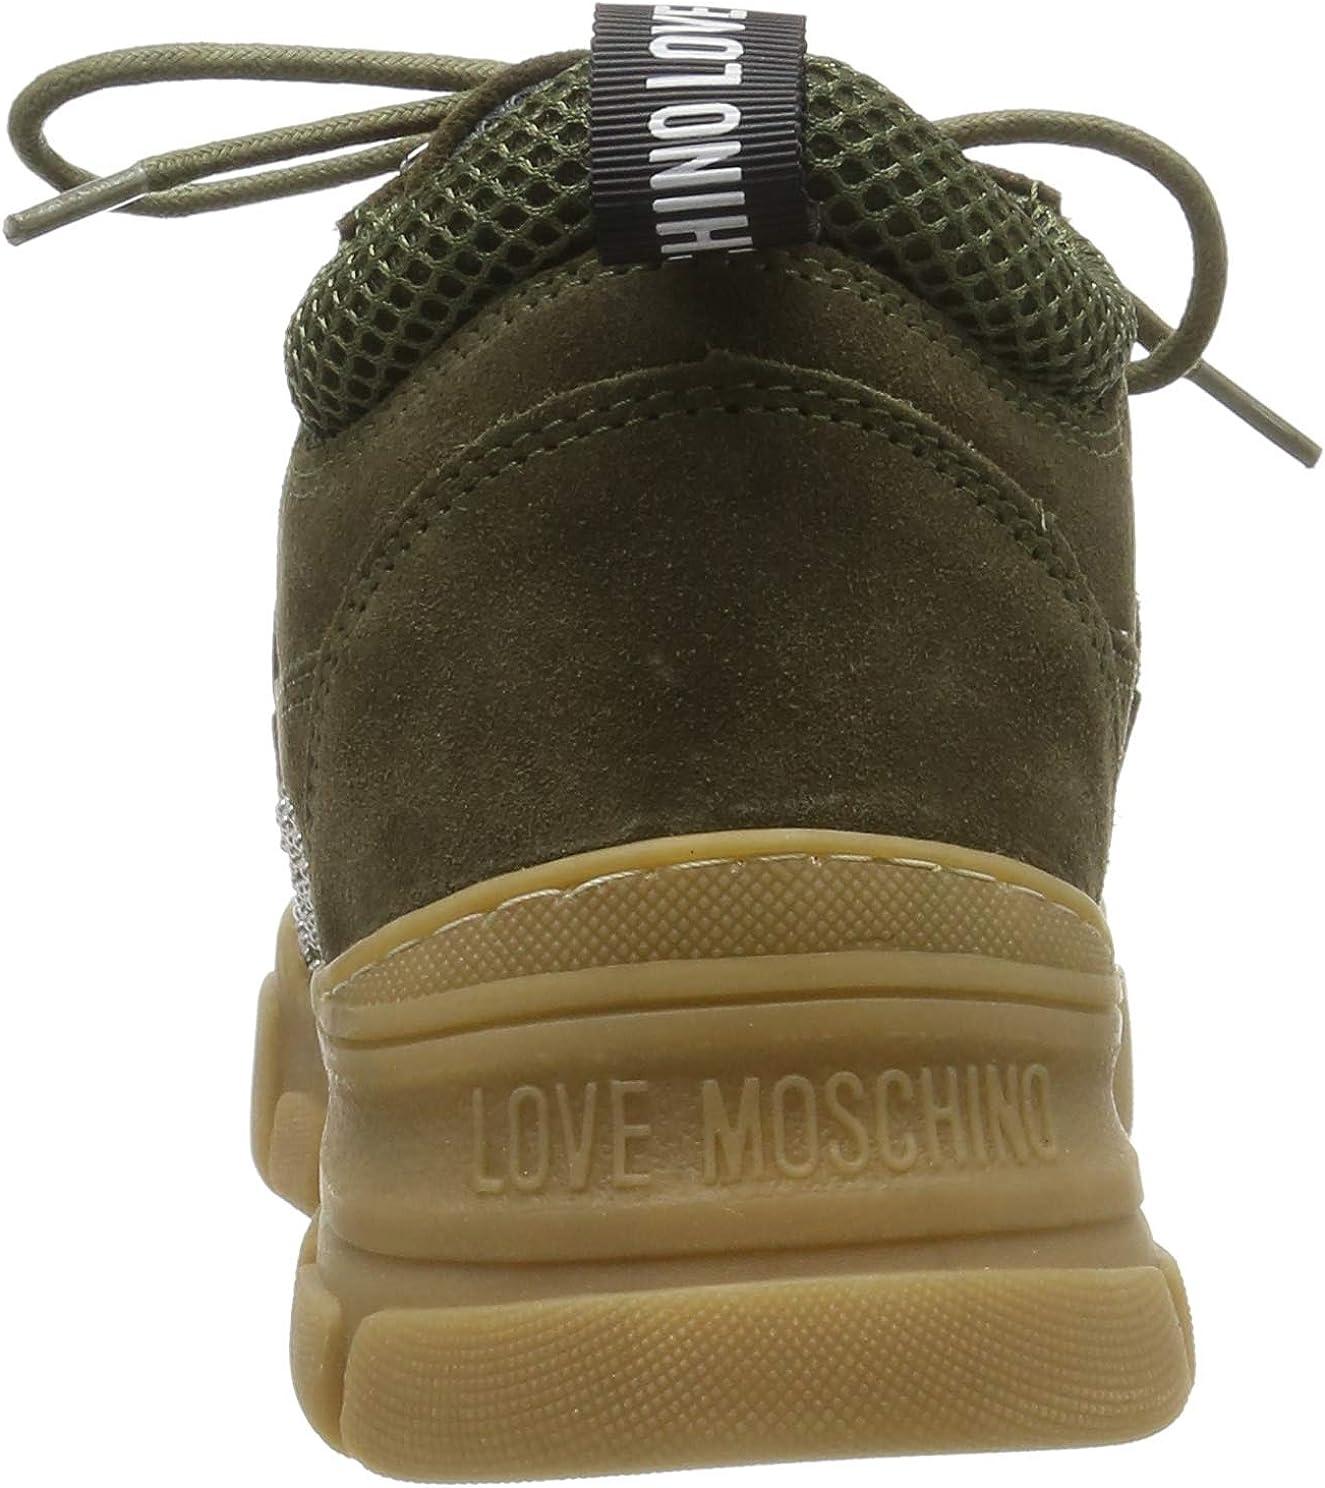 Love Moschino Womens High Hi-Top Trainers